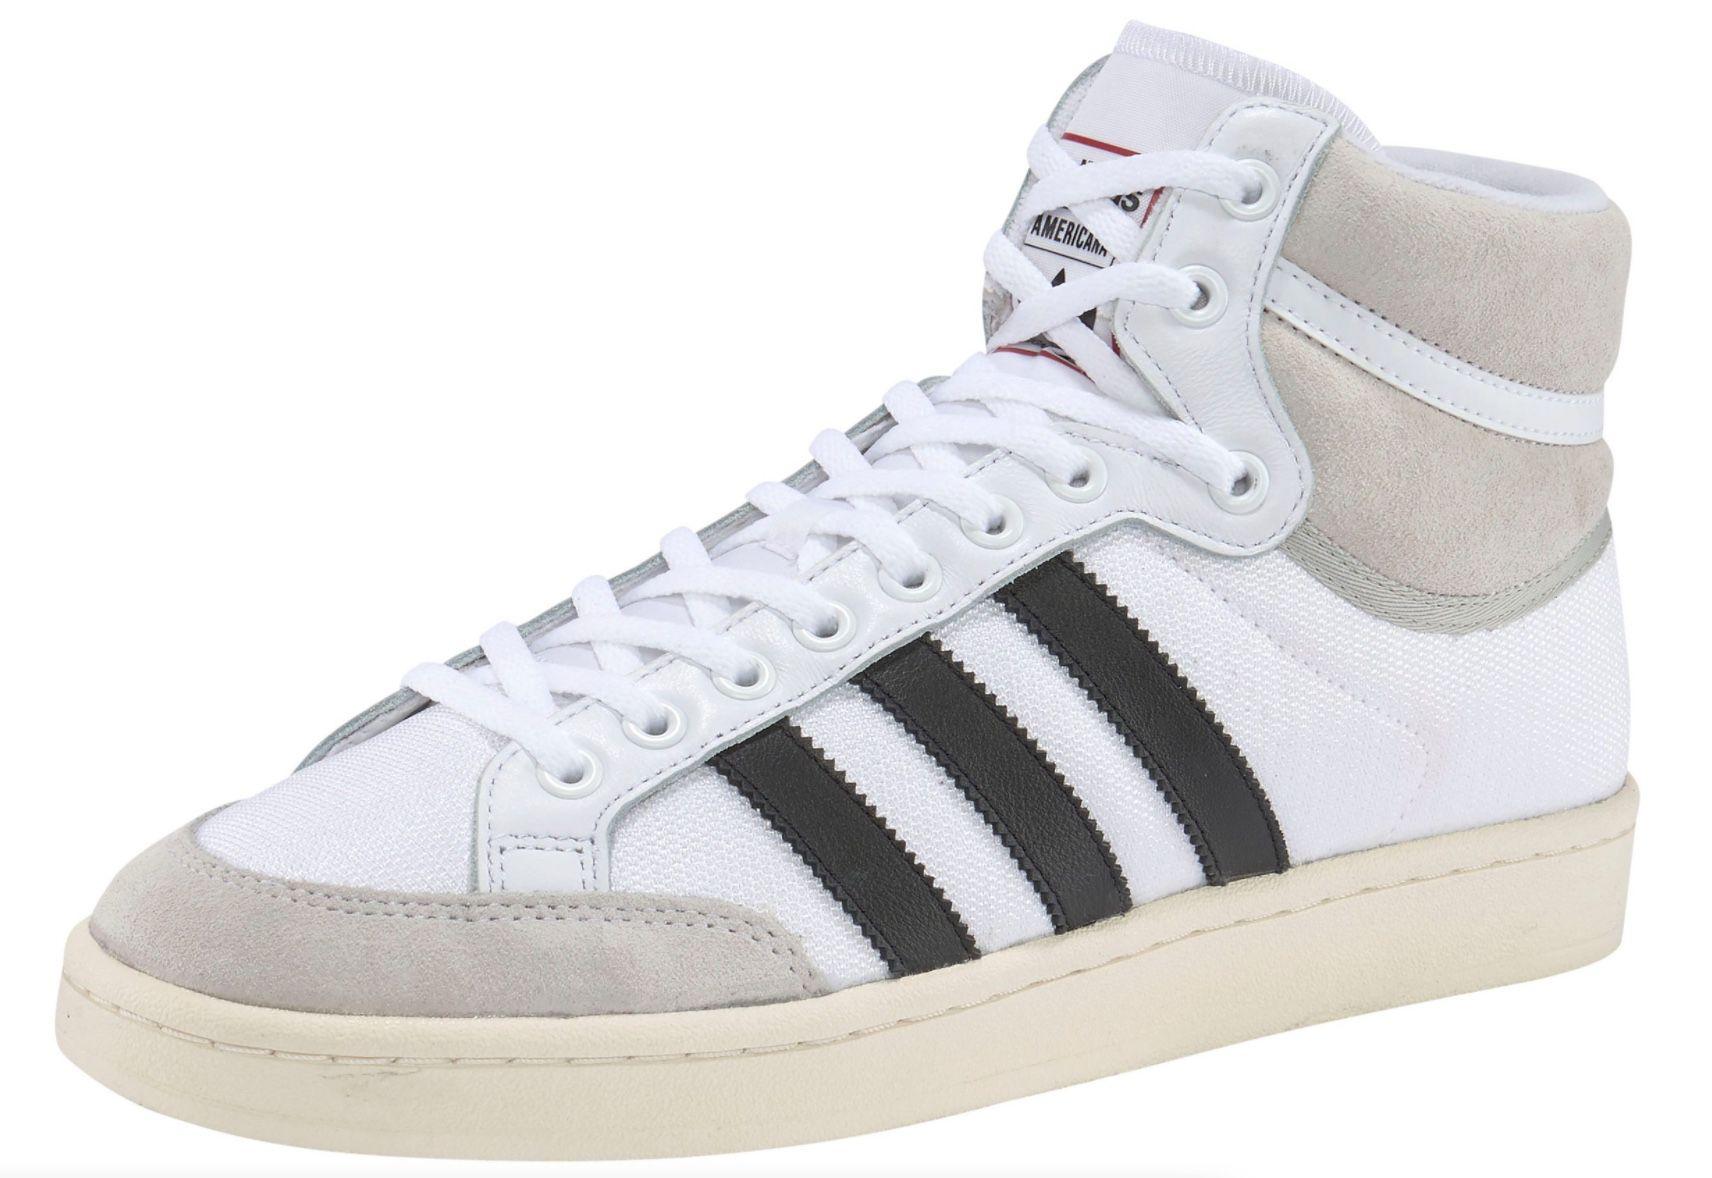 adidas Originals Americana Hi Sneaker für 43,90€ (statt 61€)